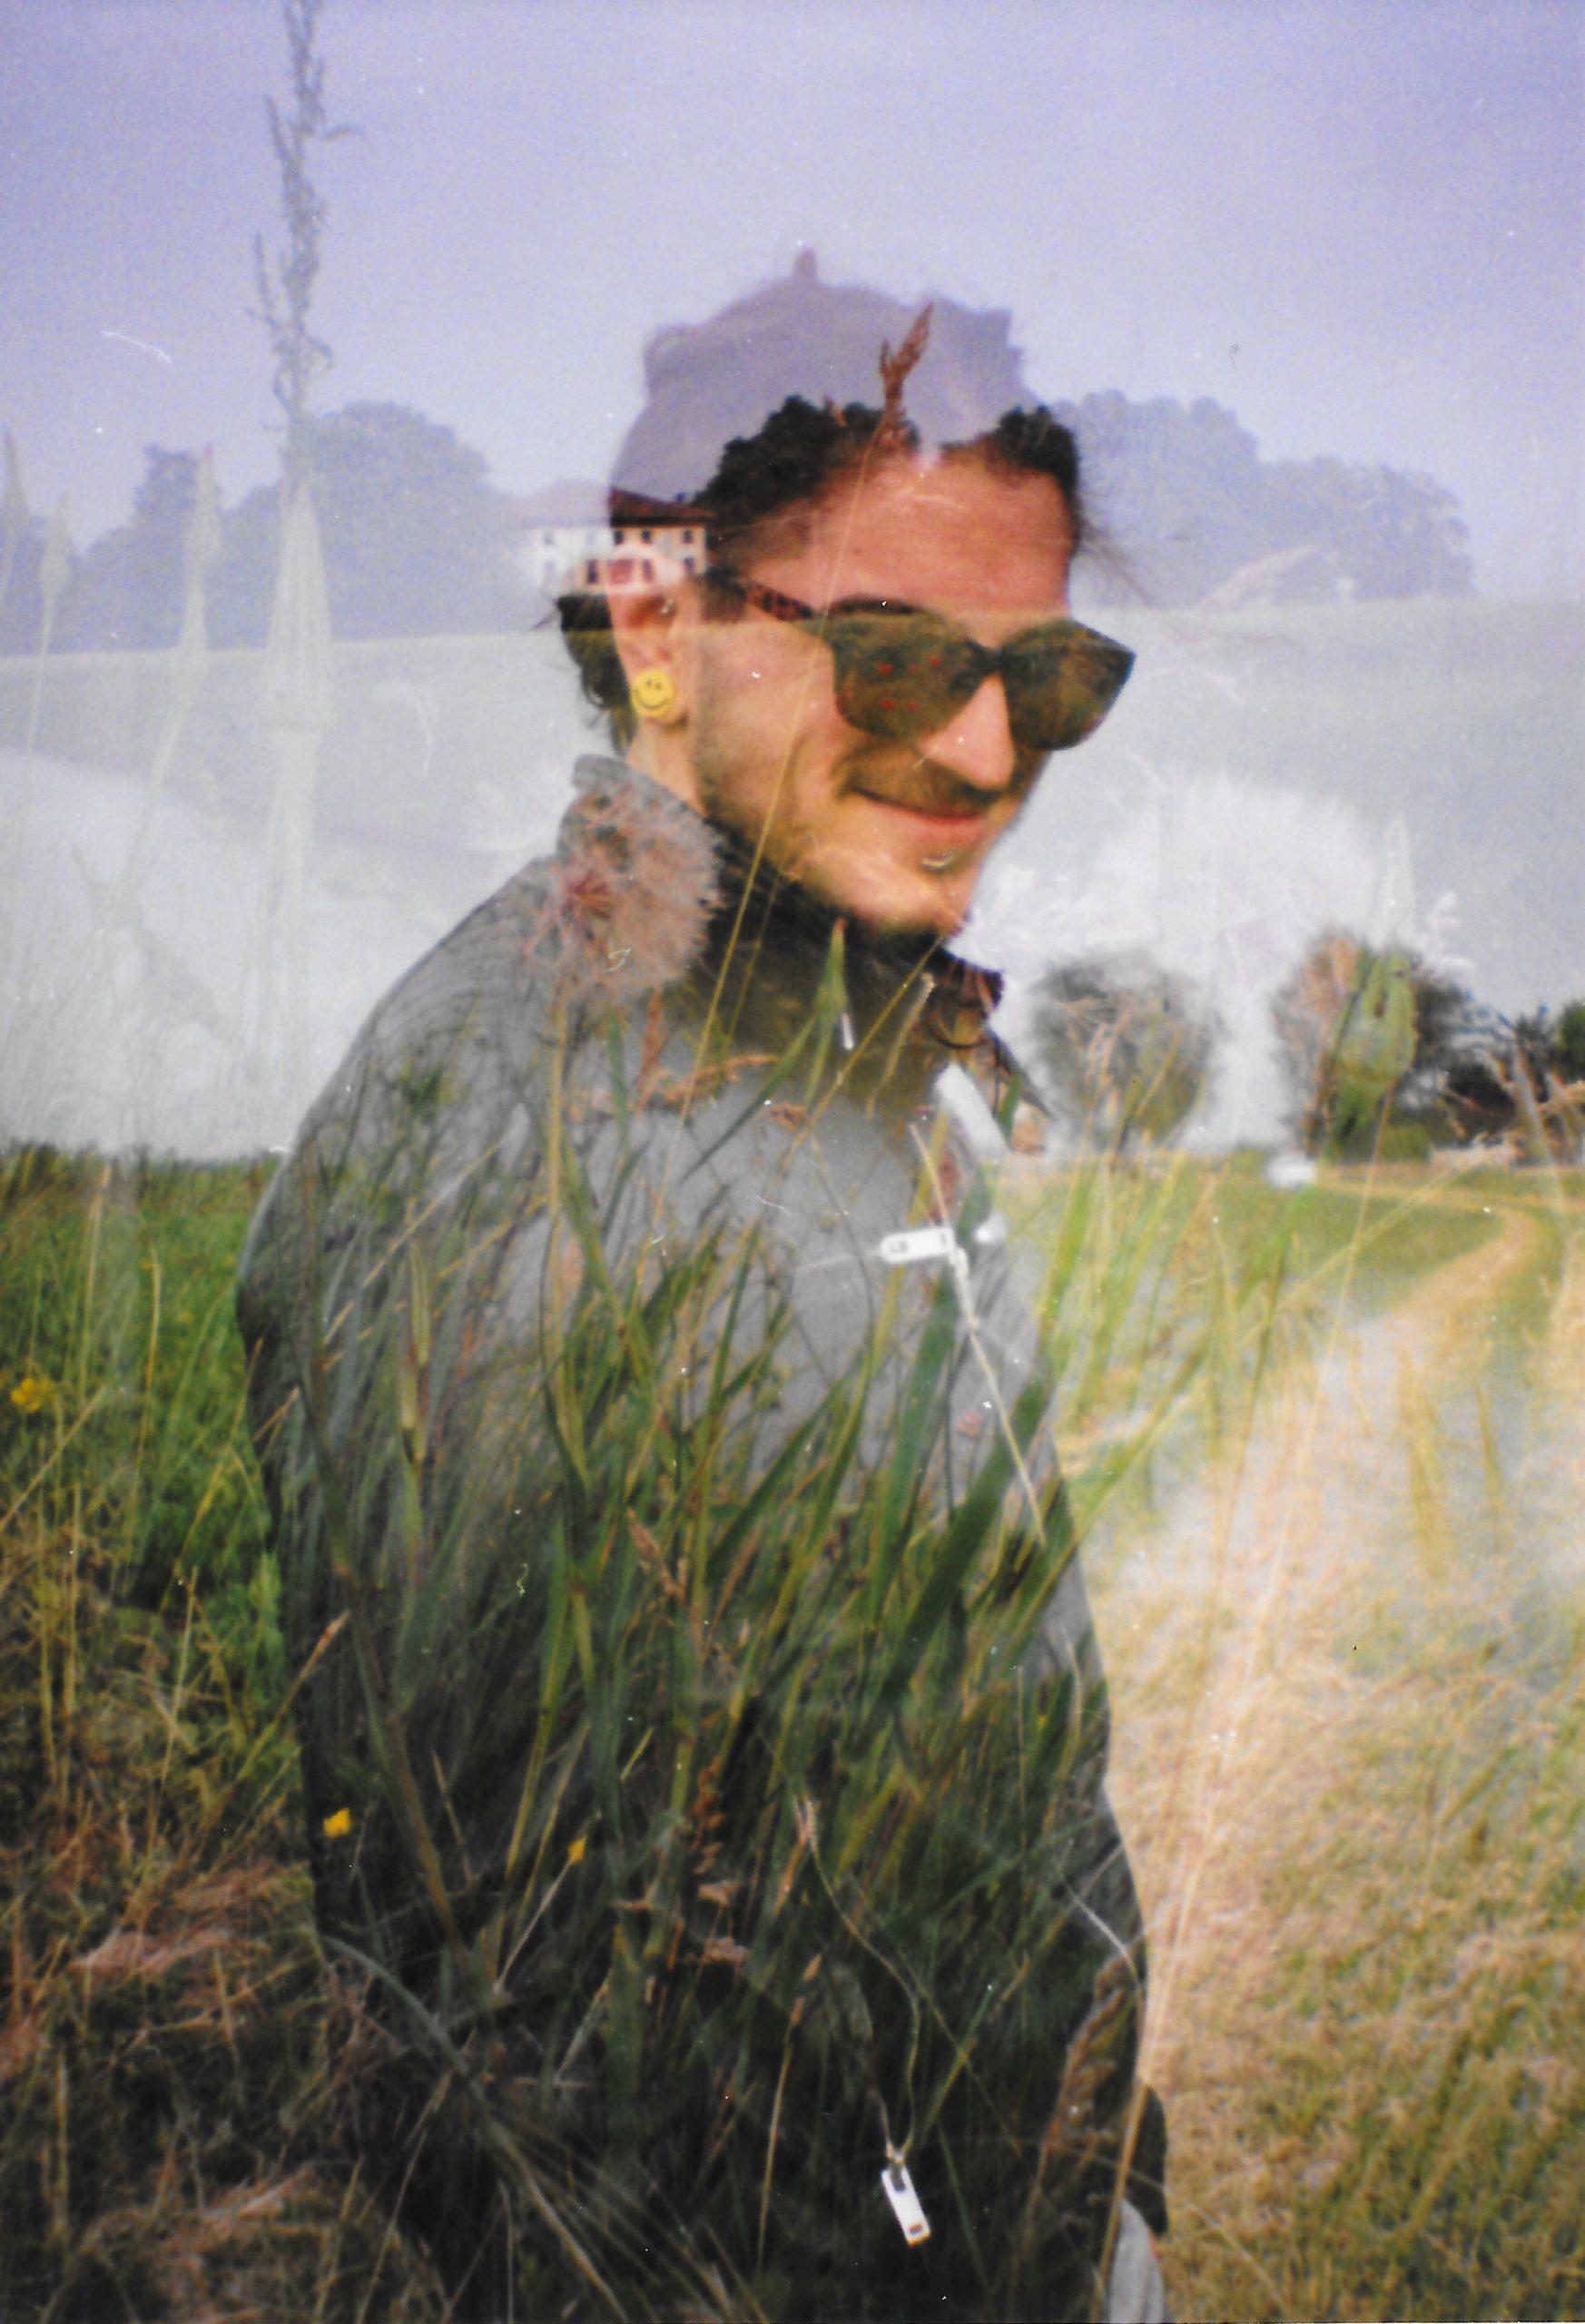 35mm Fujifilm 400iso Mini Diana